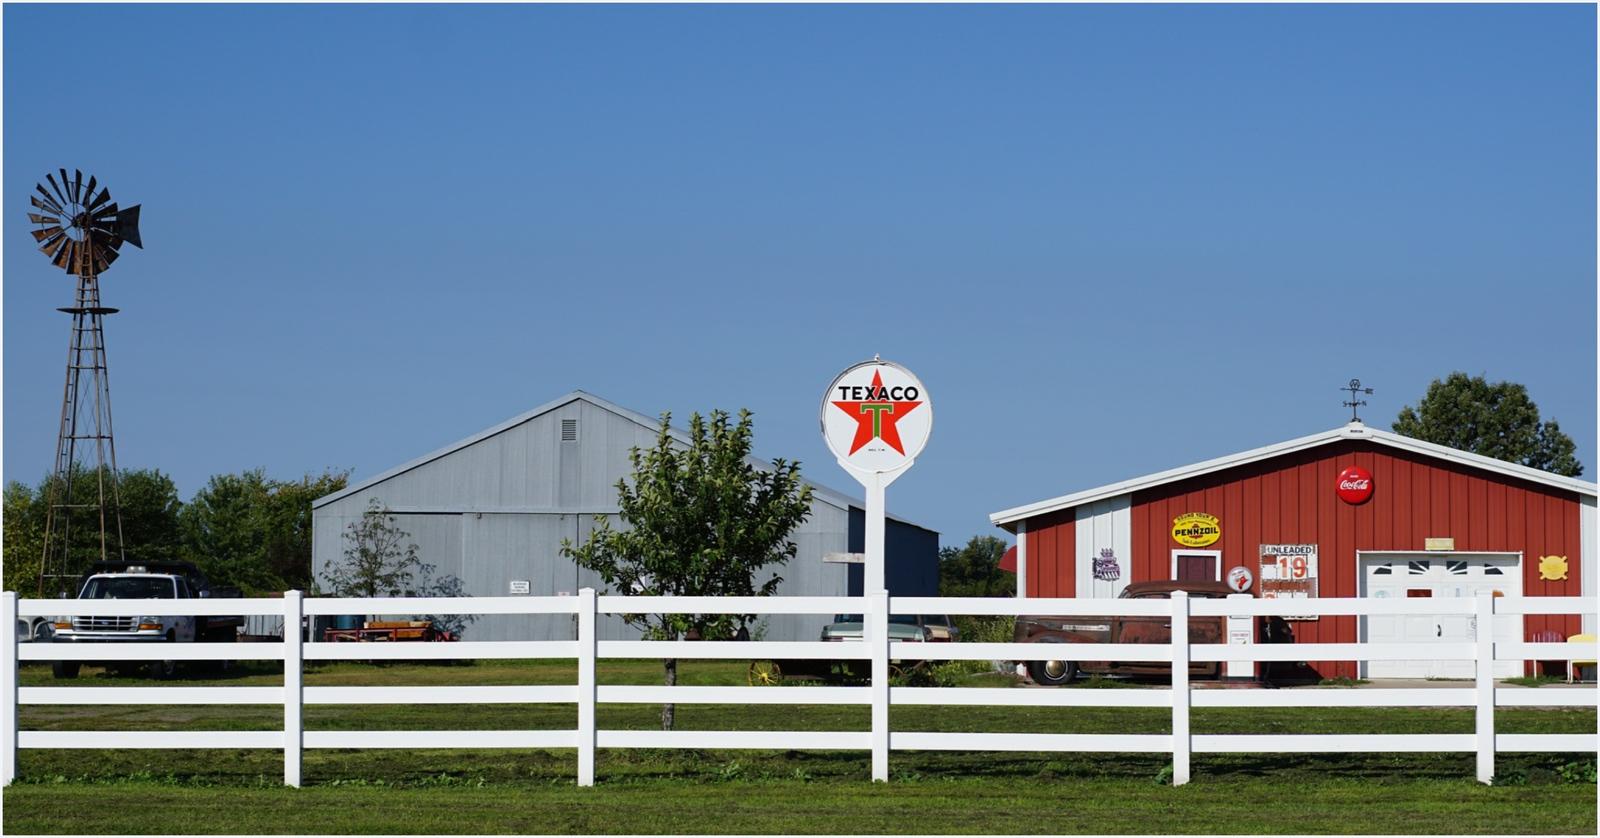 A slice of Americana in rural Minnesota